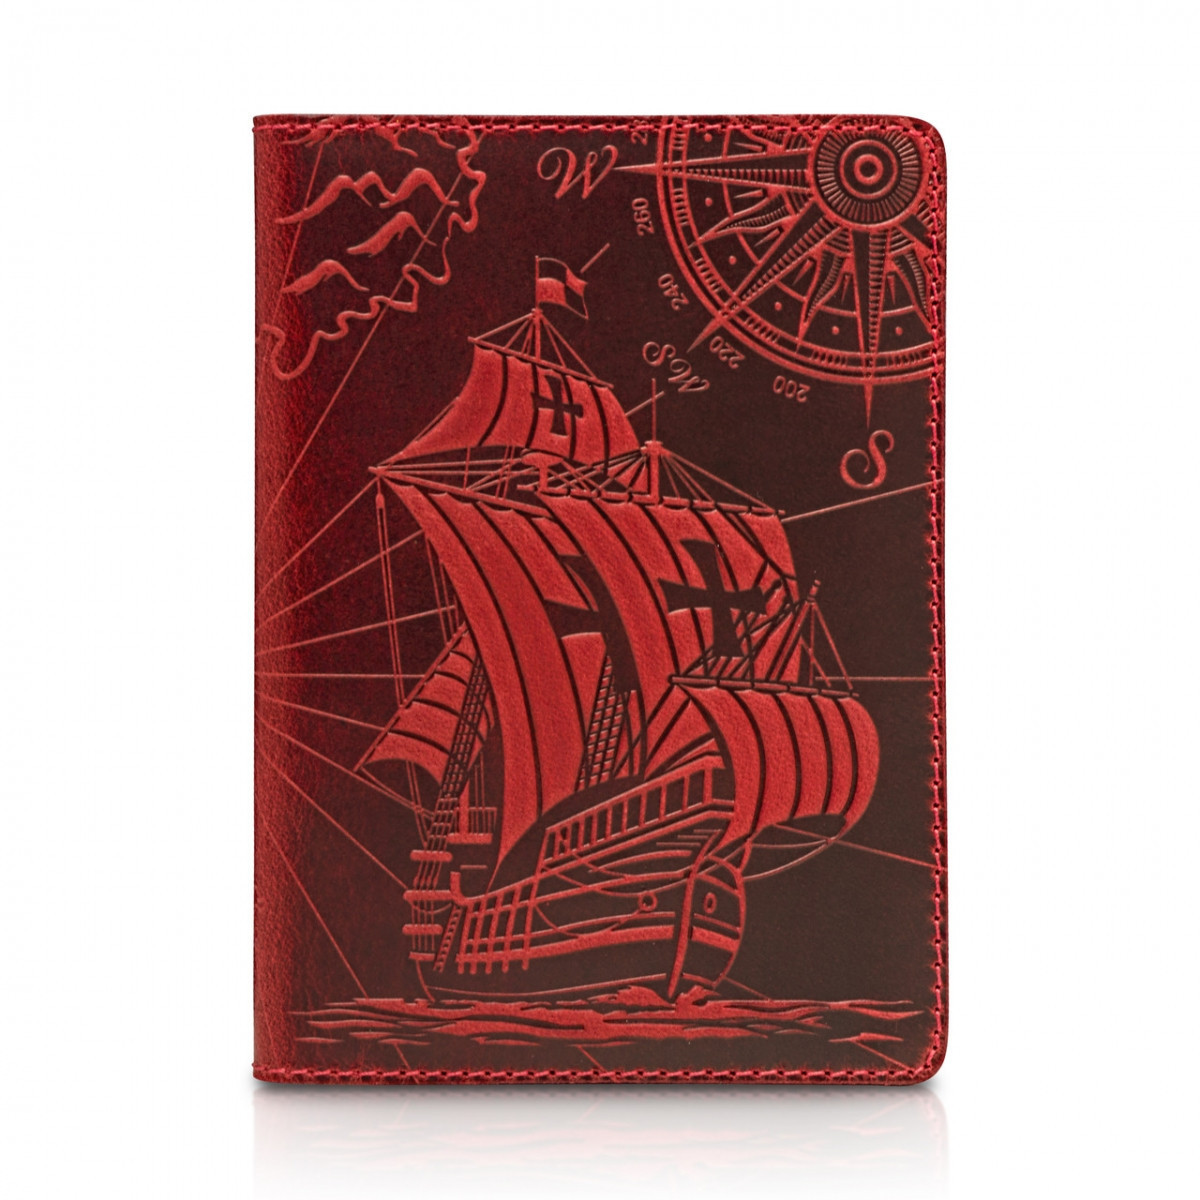 Обложка для паспорта HiArt Shabby Red Berry Discoveries